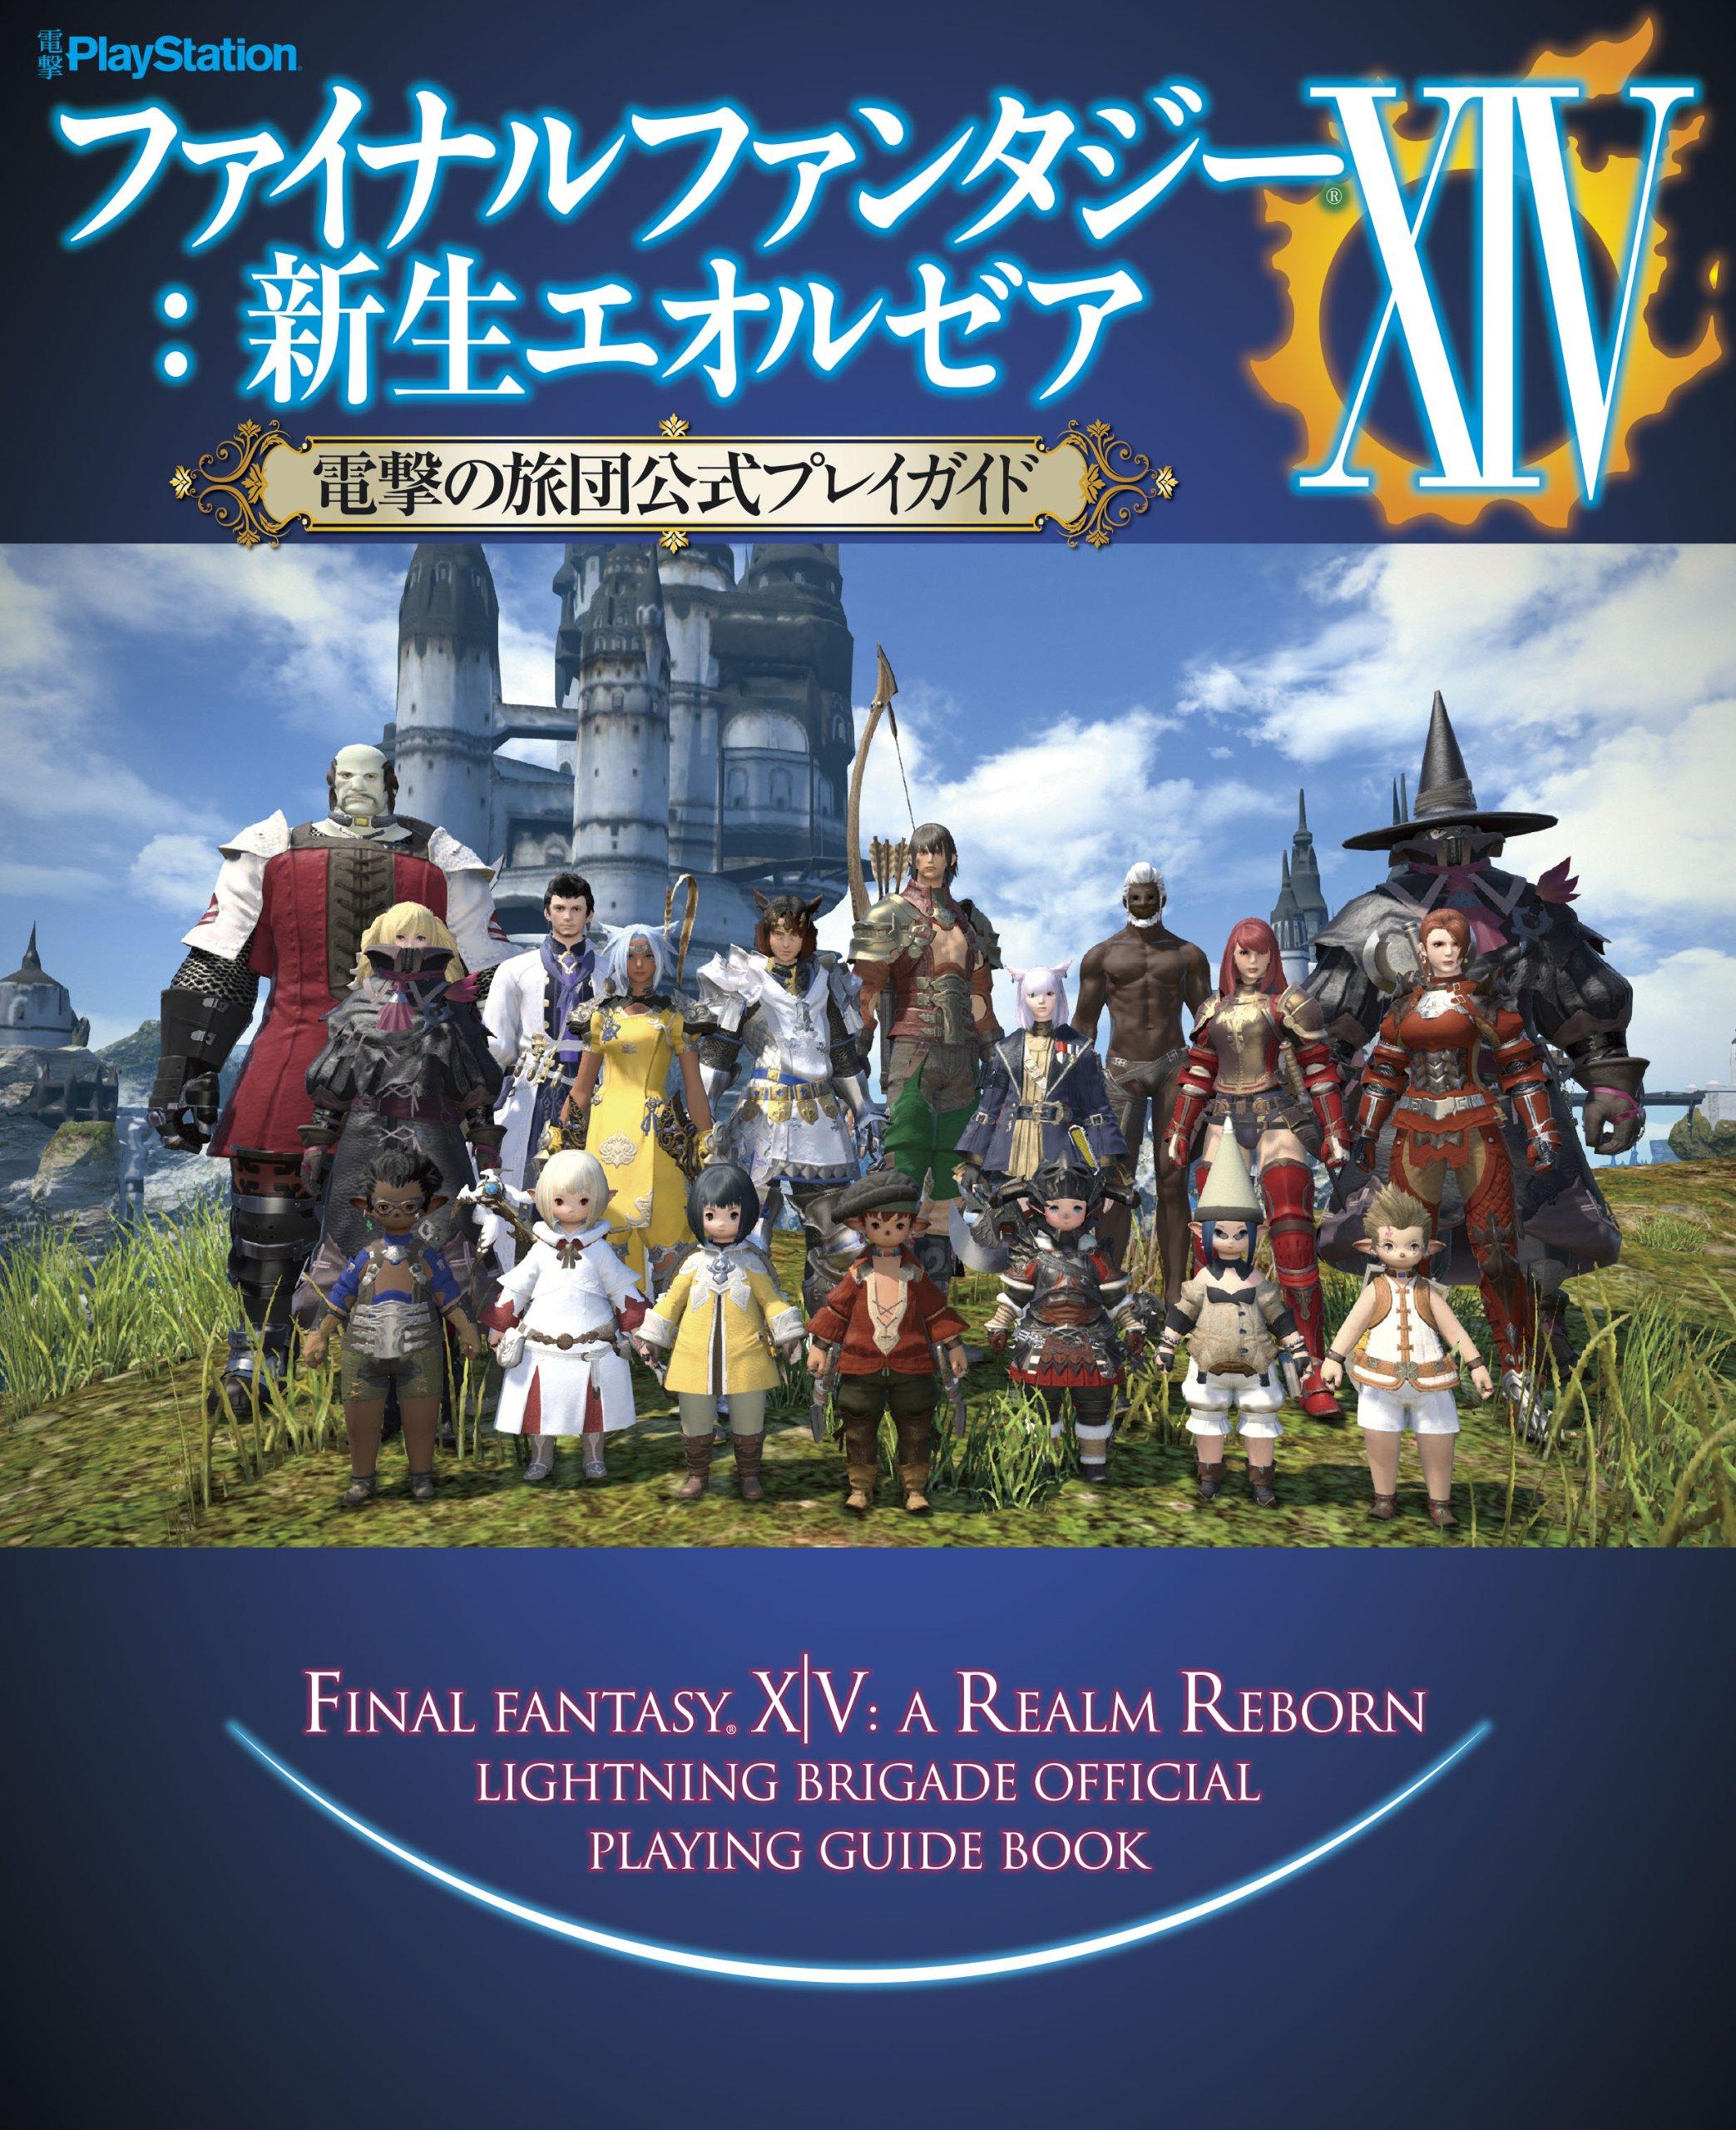 Final fantasy xiv a realm reborn leveling guide.